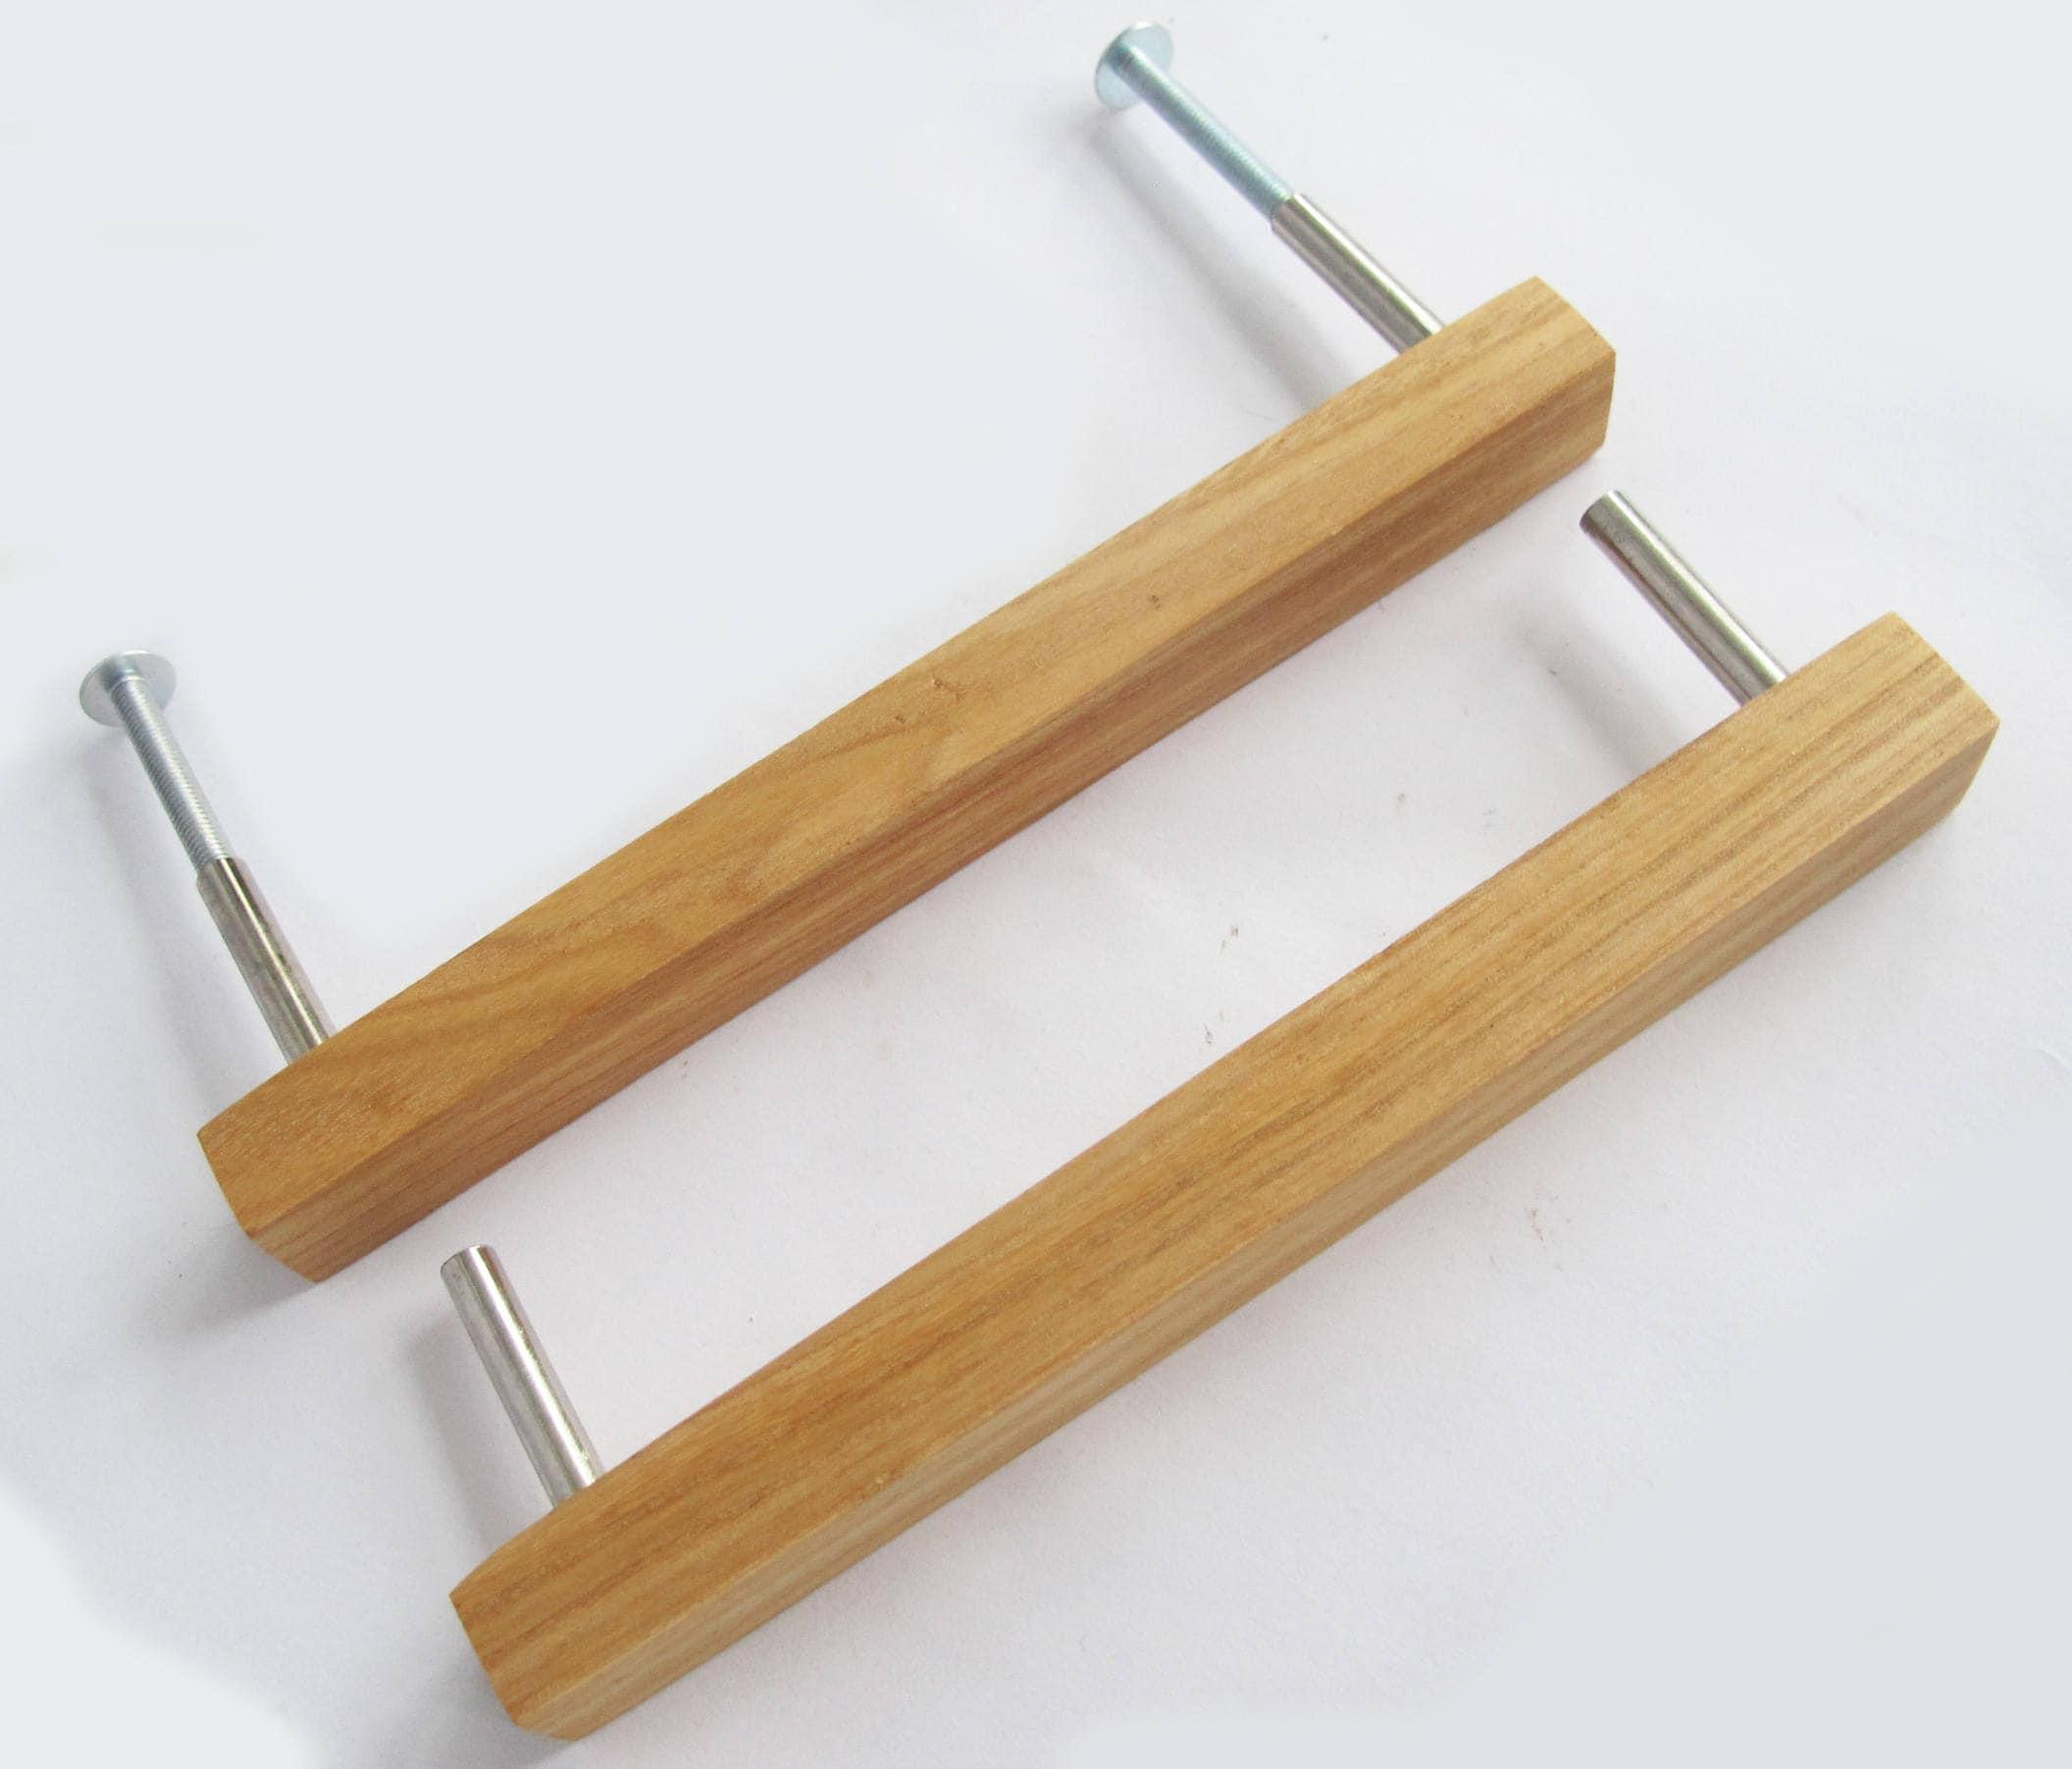 Wooden drawer pulls set of oak wood handles